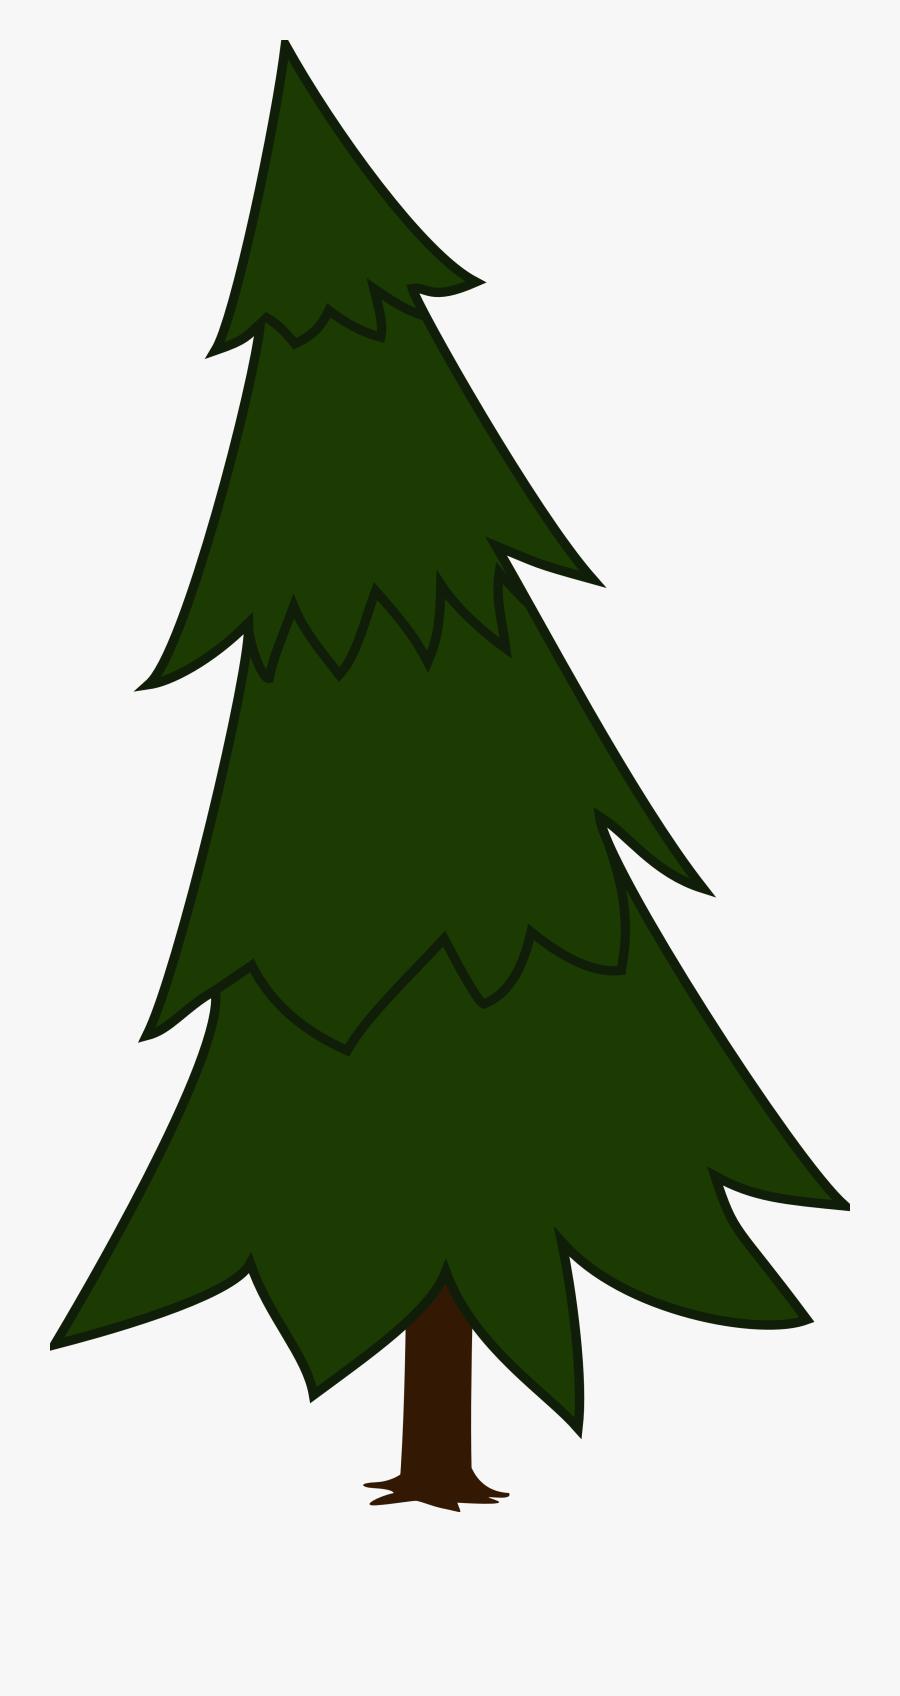 Pine Tree Svg Clipart - Tree Clipart Pine, Transparent Clipart